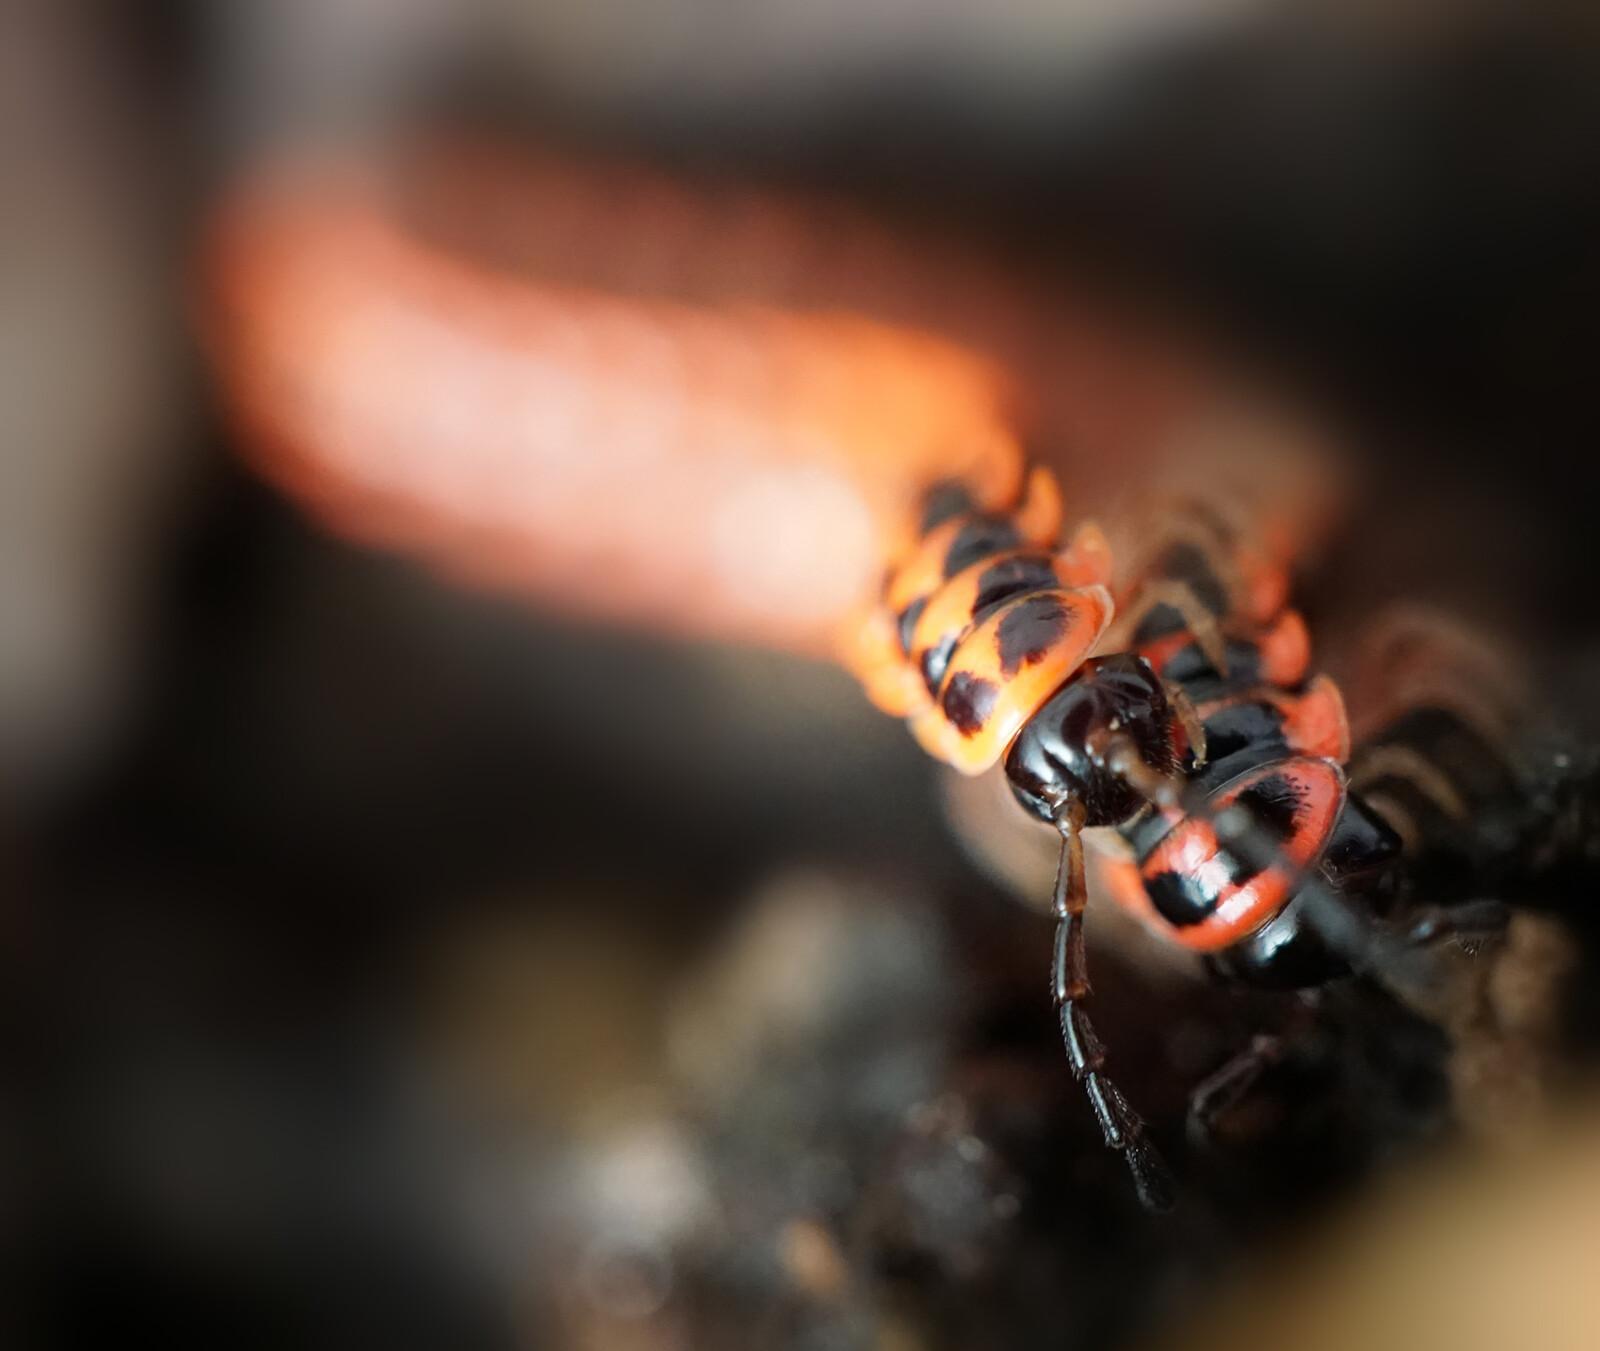 Antheromorpha uncinata